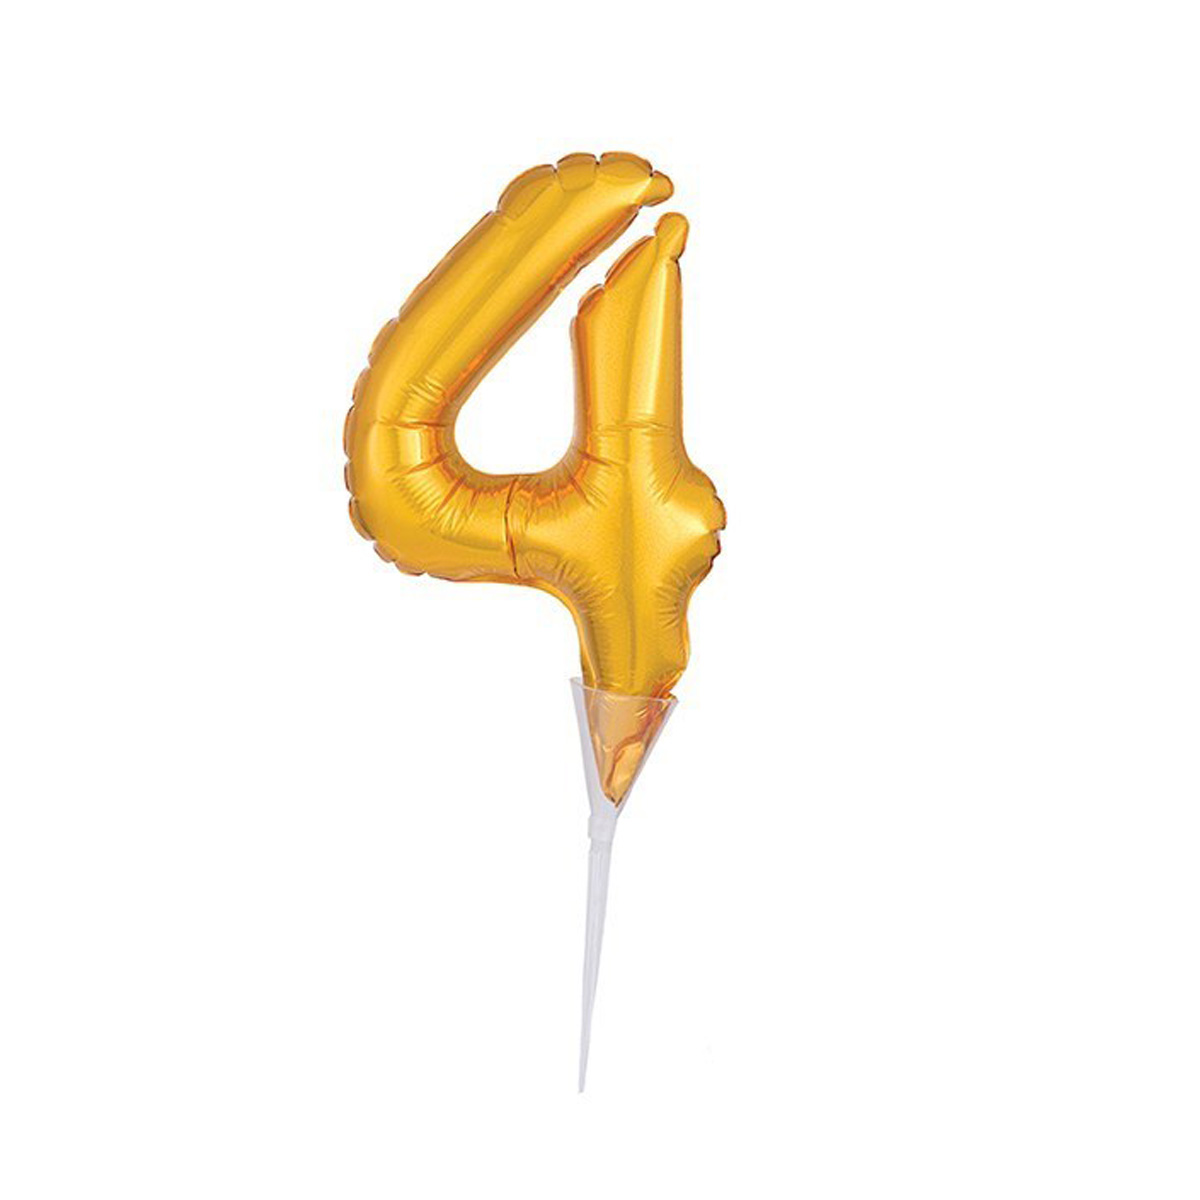 Cake Topper Luftballon Zahlenballon Gold - Zahl 4